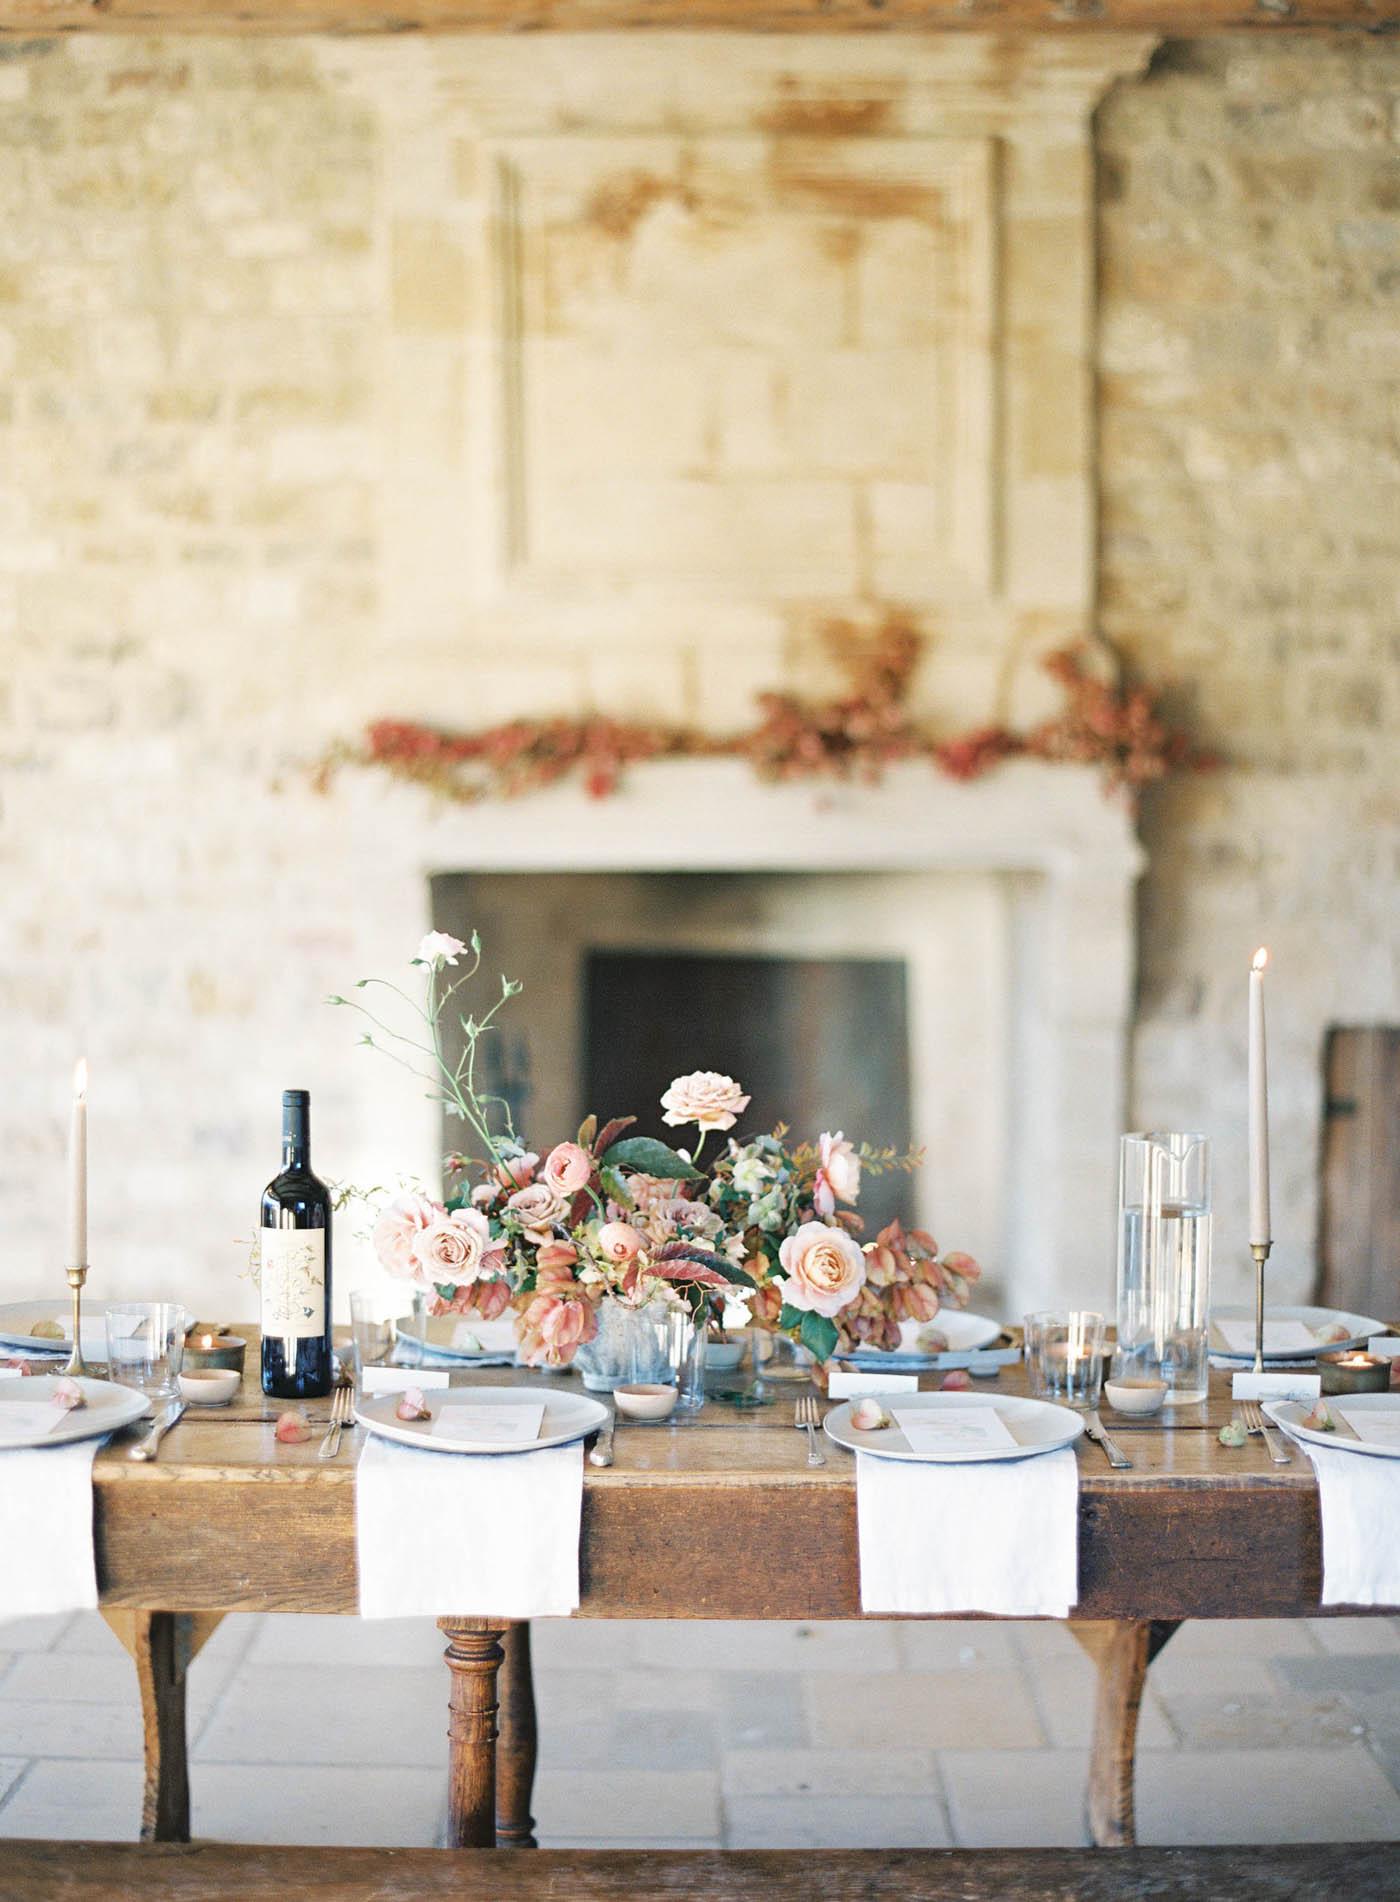 sunstone-villa-kitchen-wedding-jen-huang-15.jpg